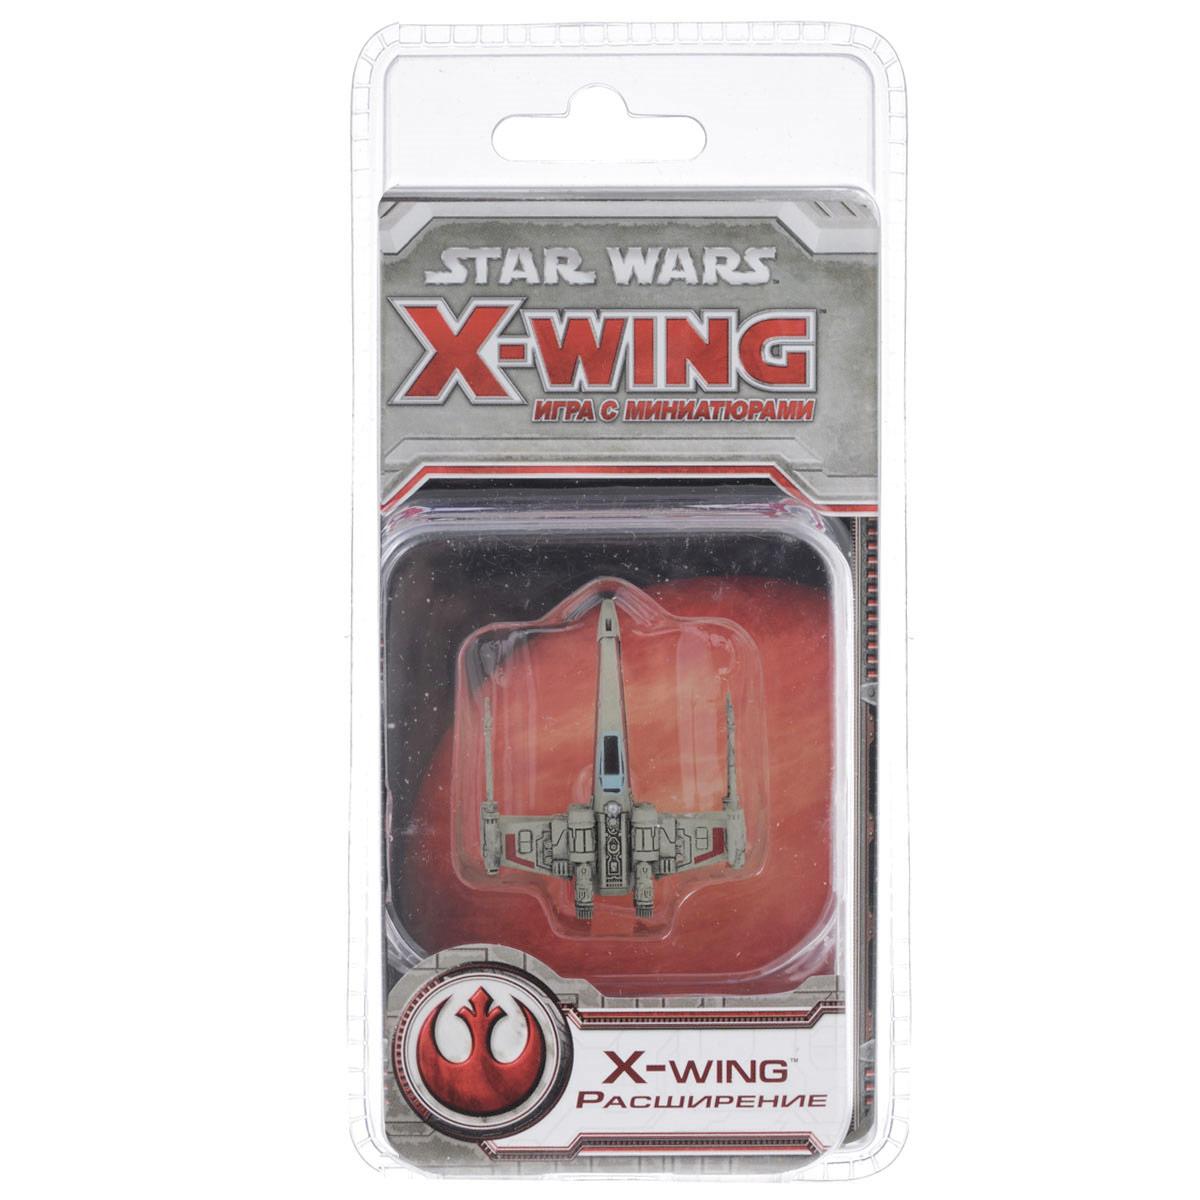 Hobby World Расширение для настольной игры Star Wars X-Wing X-Wing ( 1202 )